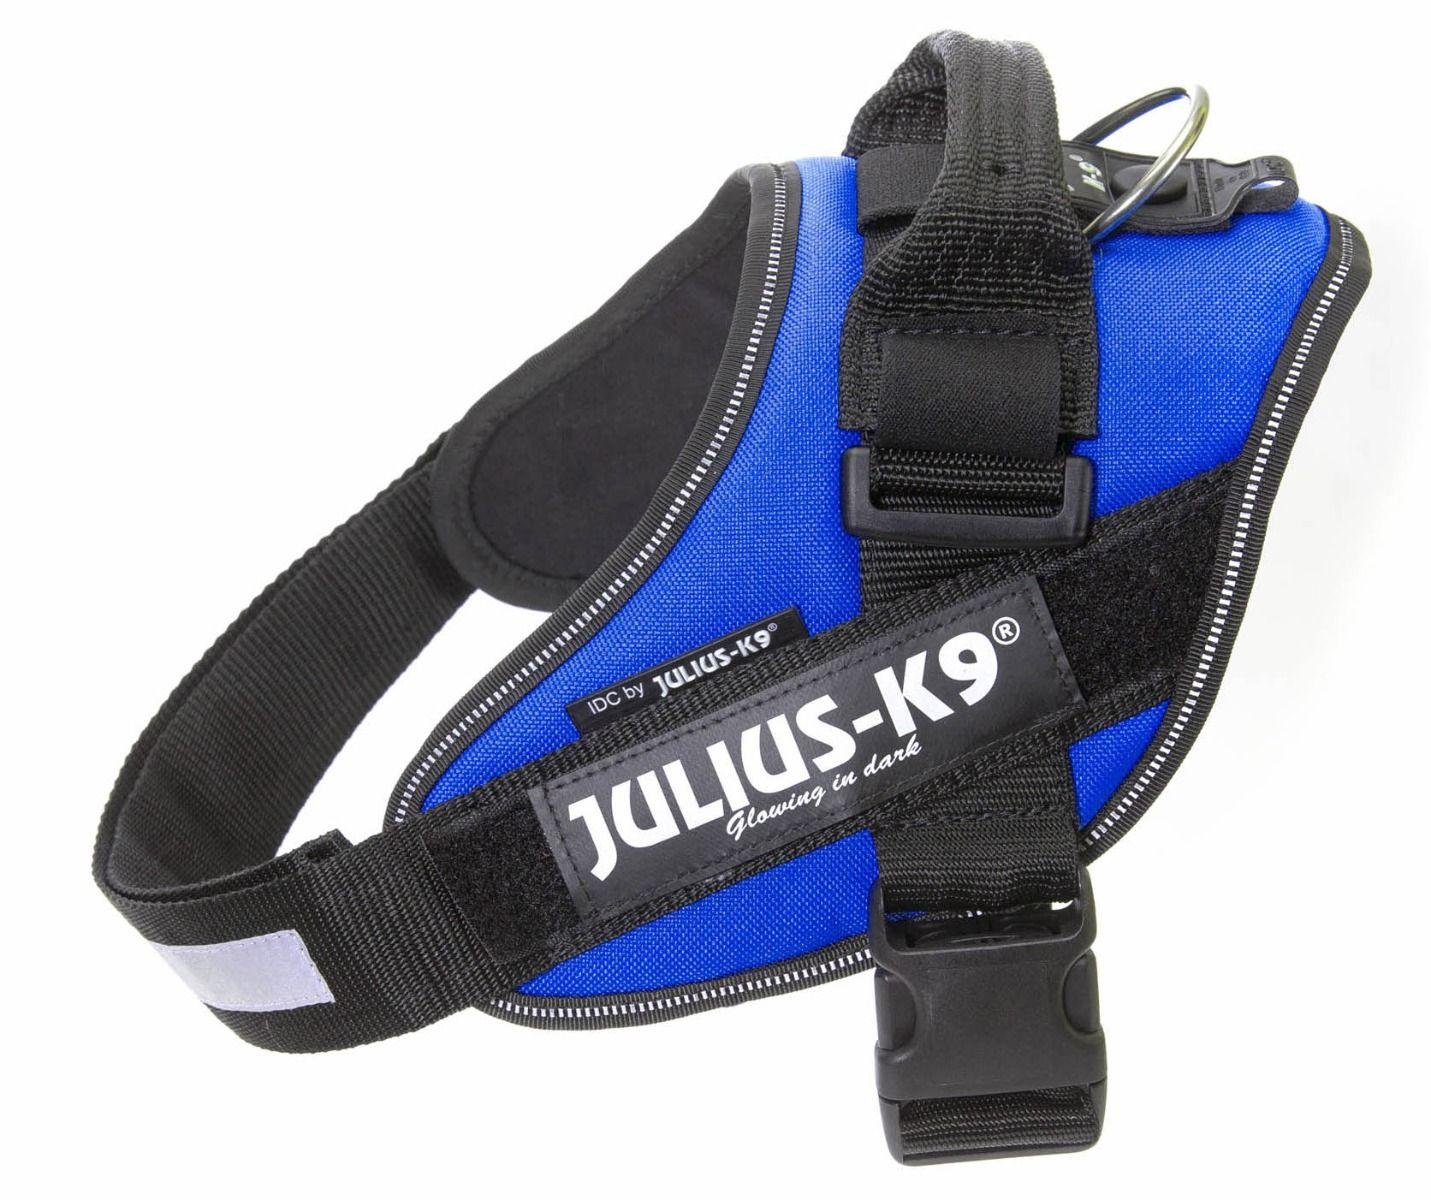 Julius K9 Harness Blue